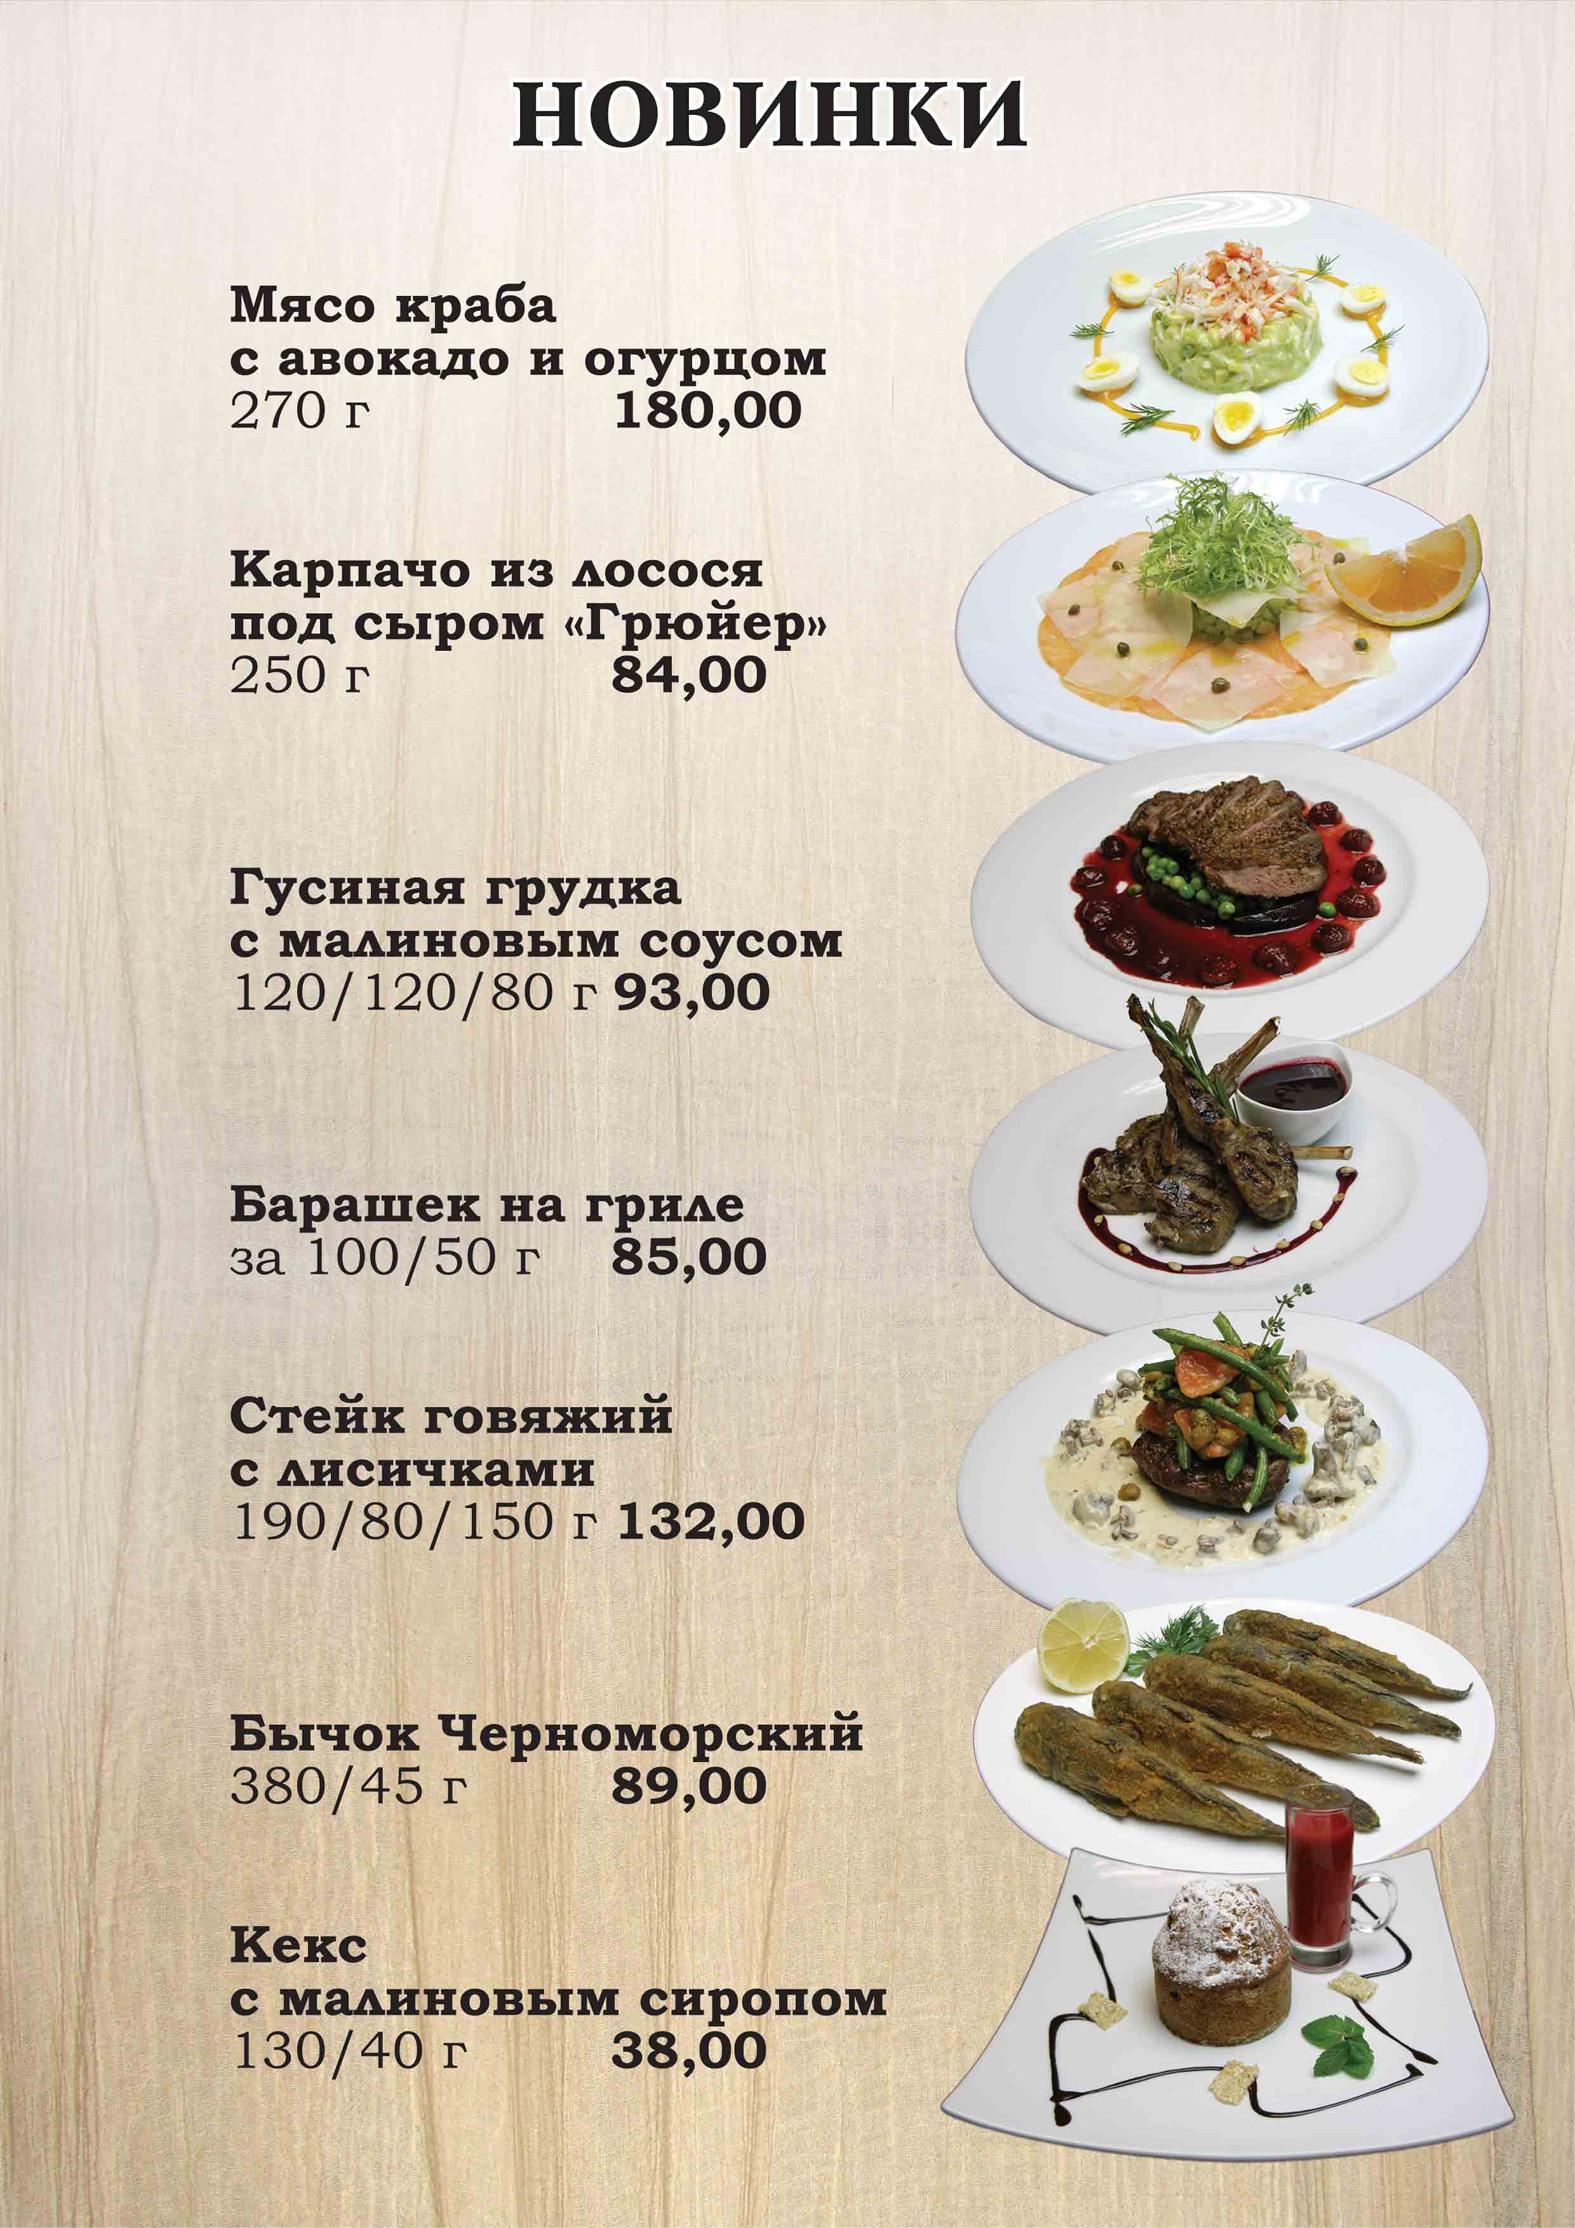 Меню ресторана ленинград в твери - b